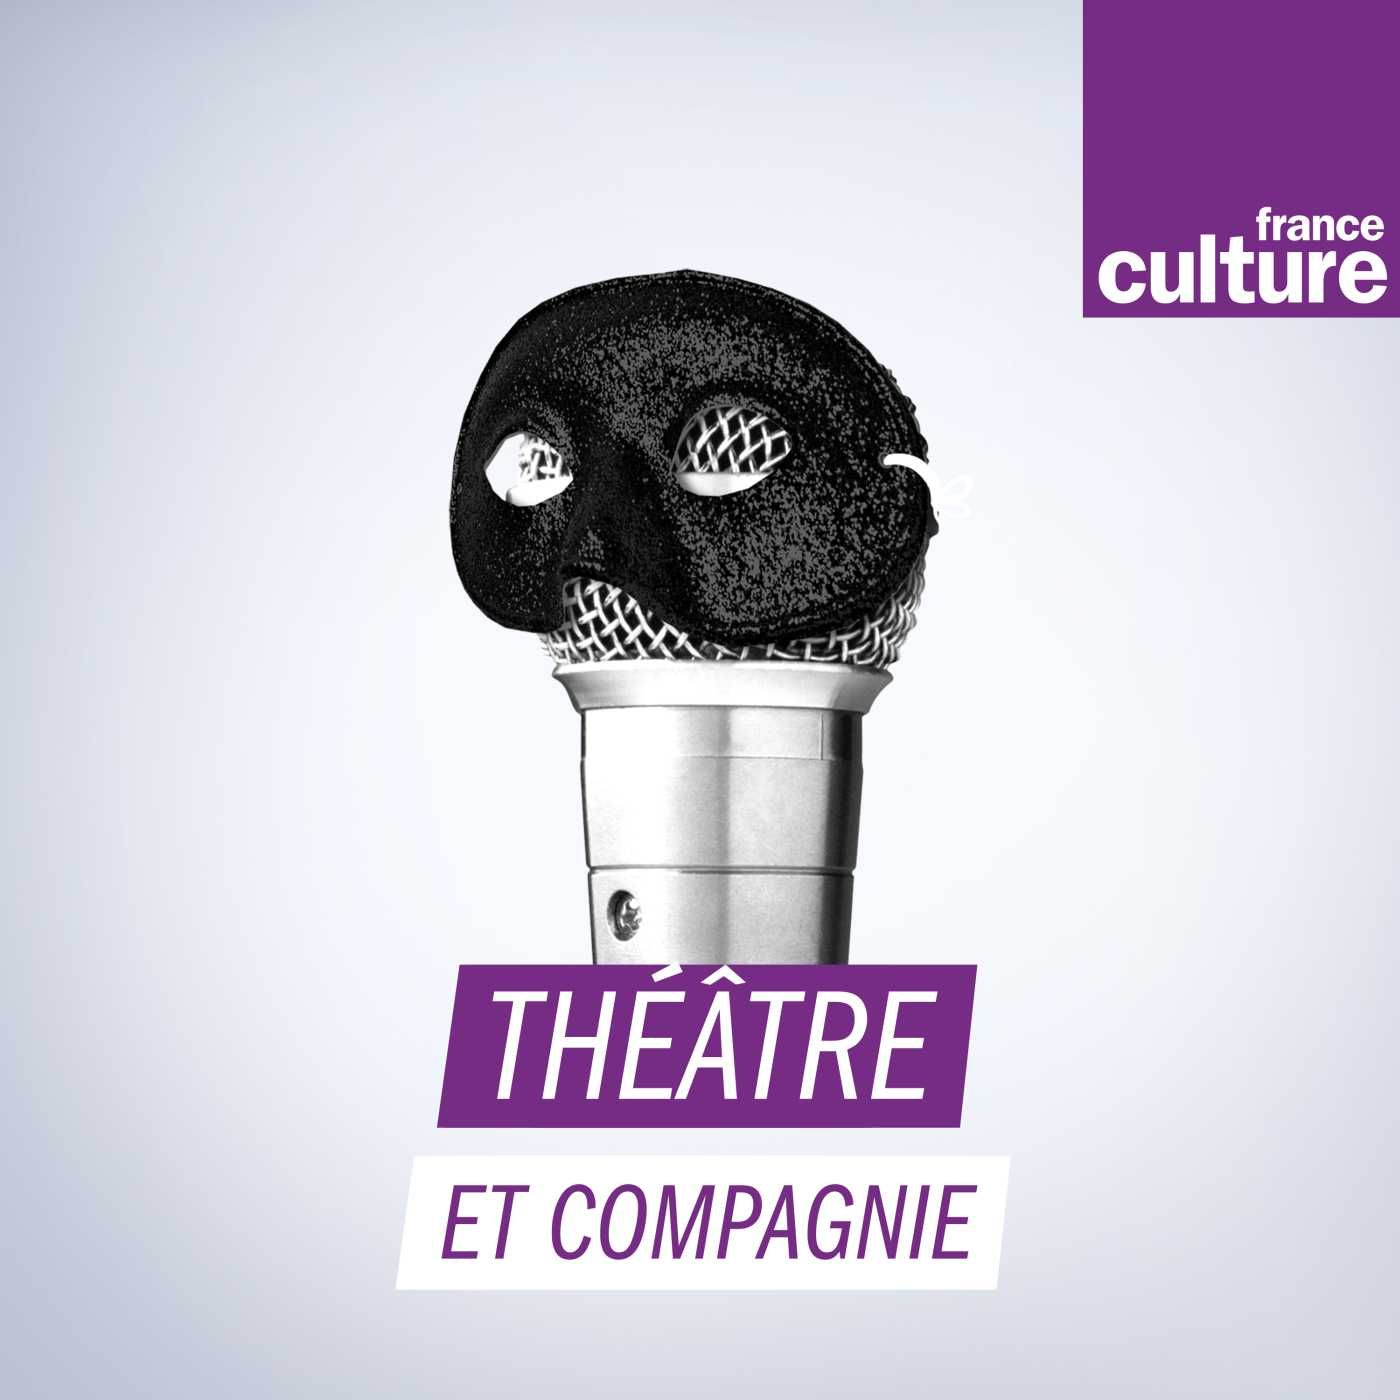 Image 1: Theatre et compagnie